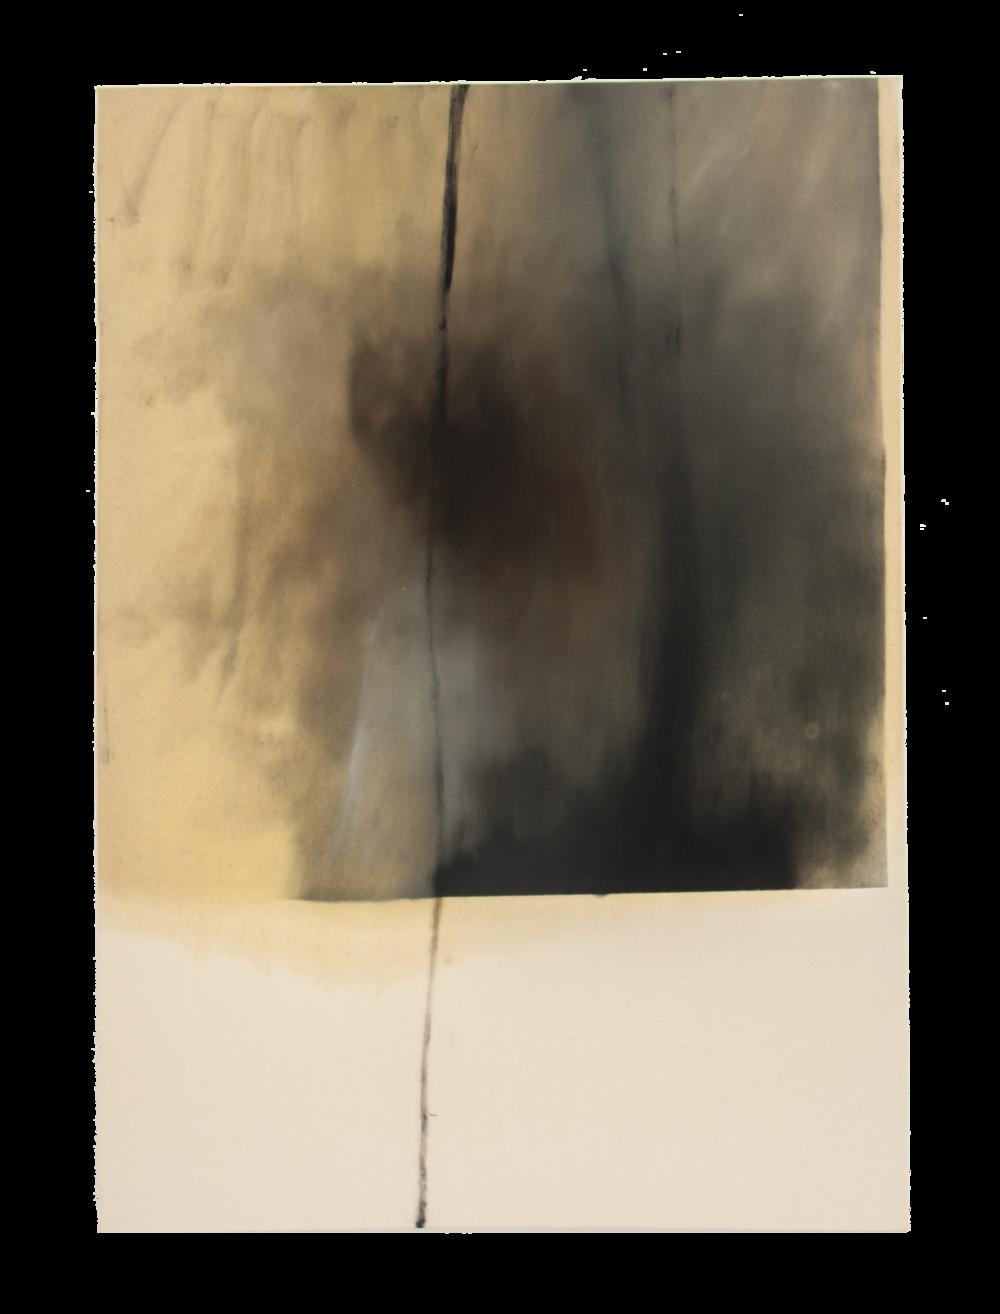 PA  Técnica: Óleo sobre tela  Medida: 100 x 70 cm  Año: 2015